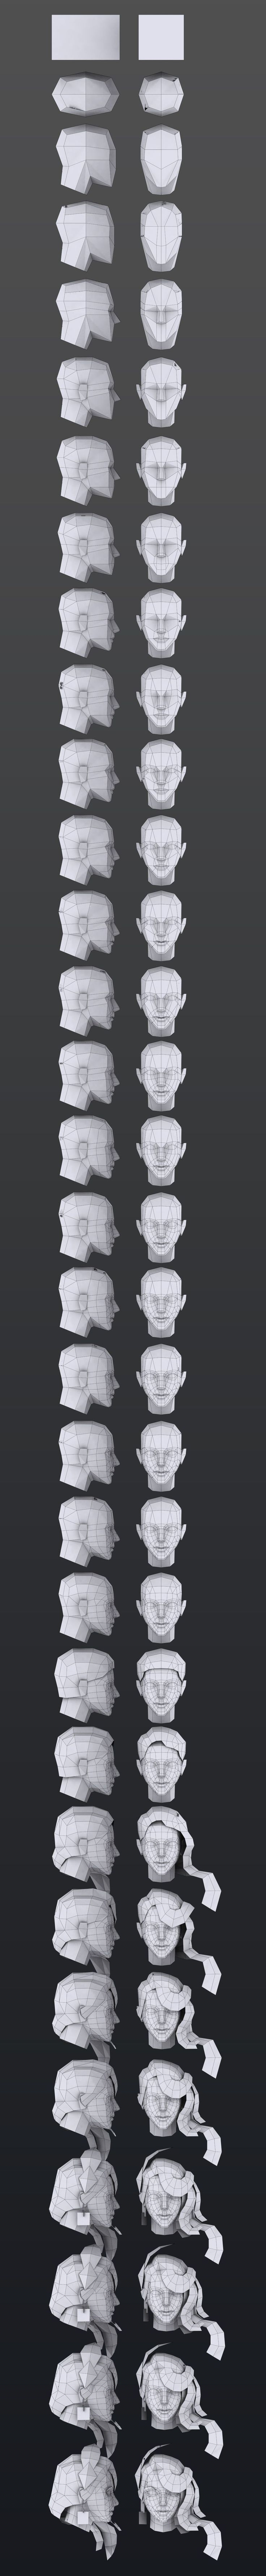 8ef20514ffb9c42afa8c6c4e00de9f43.jpg 1,000×9,697 พิกเซล